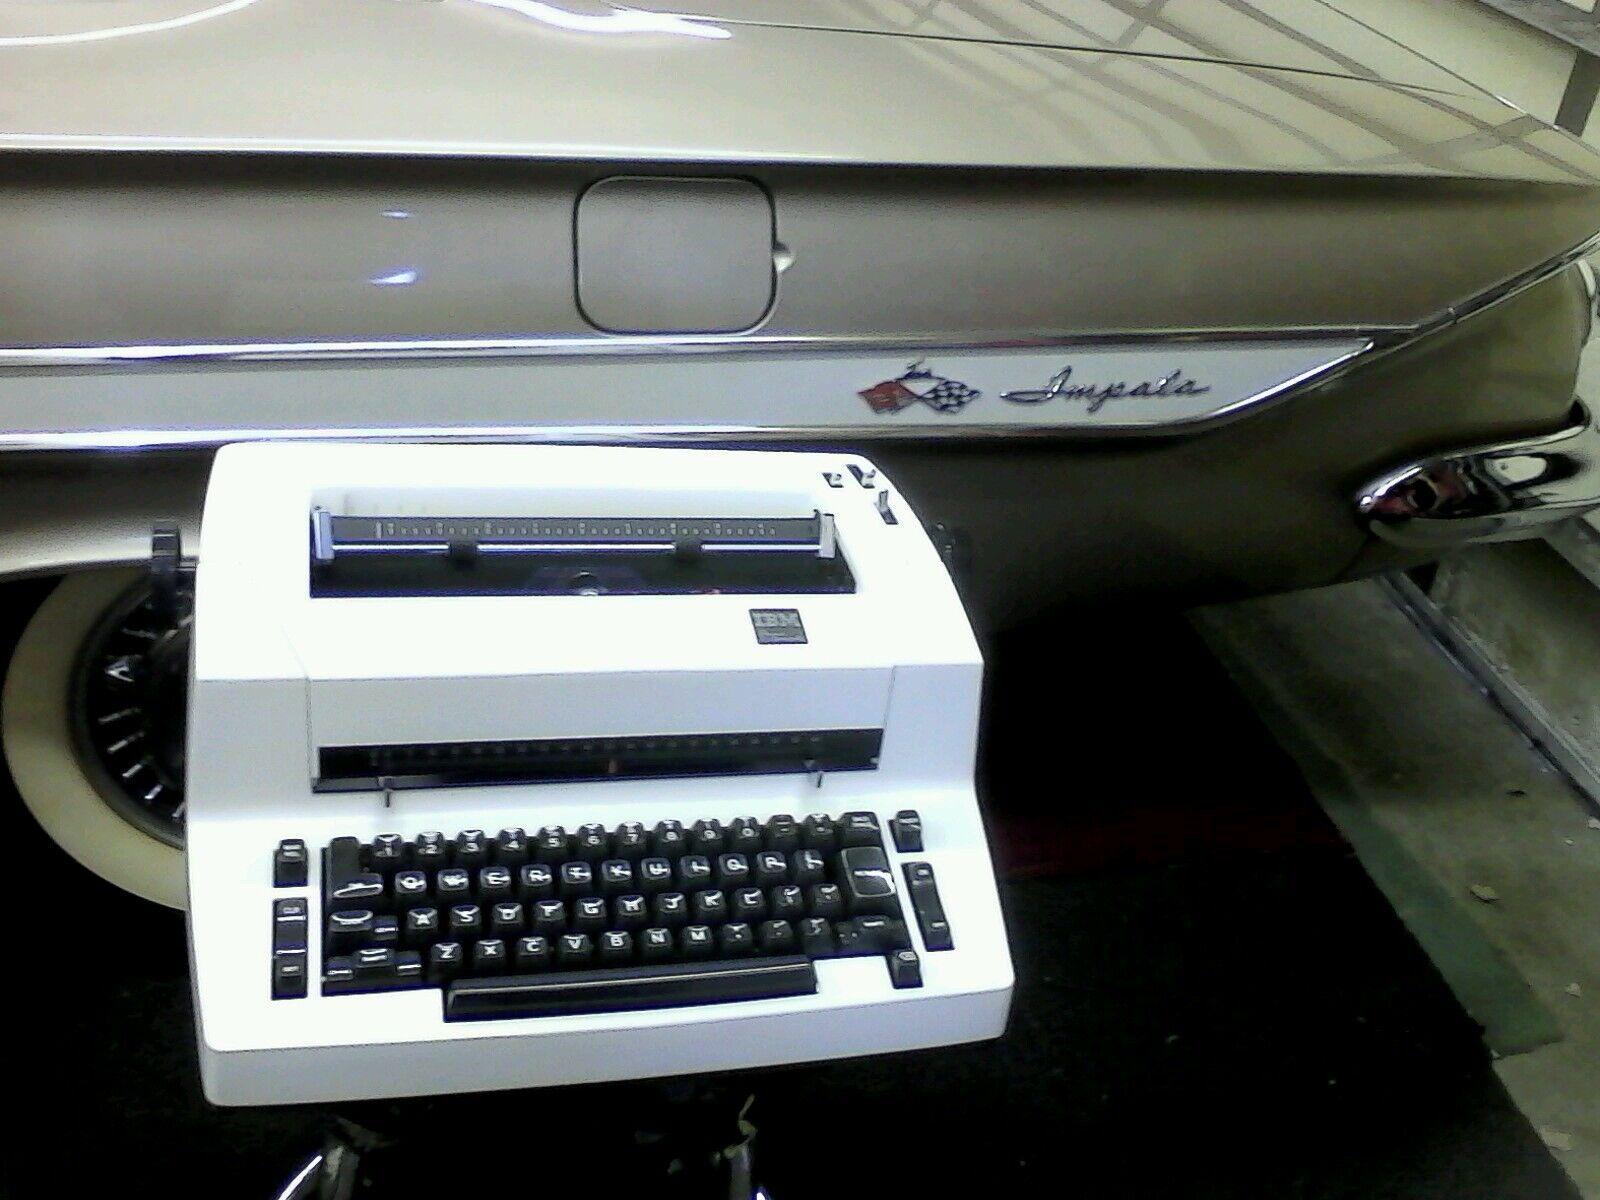 Electric typewriter service and repair